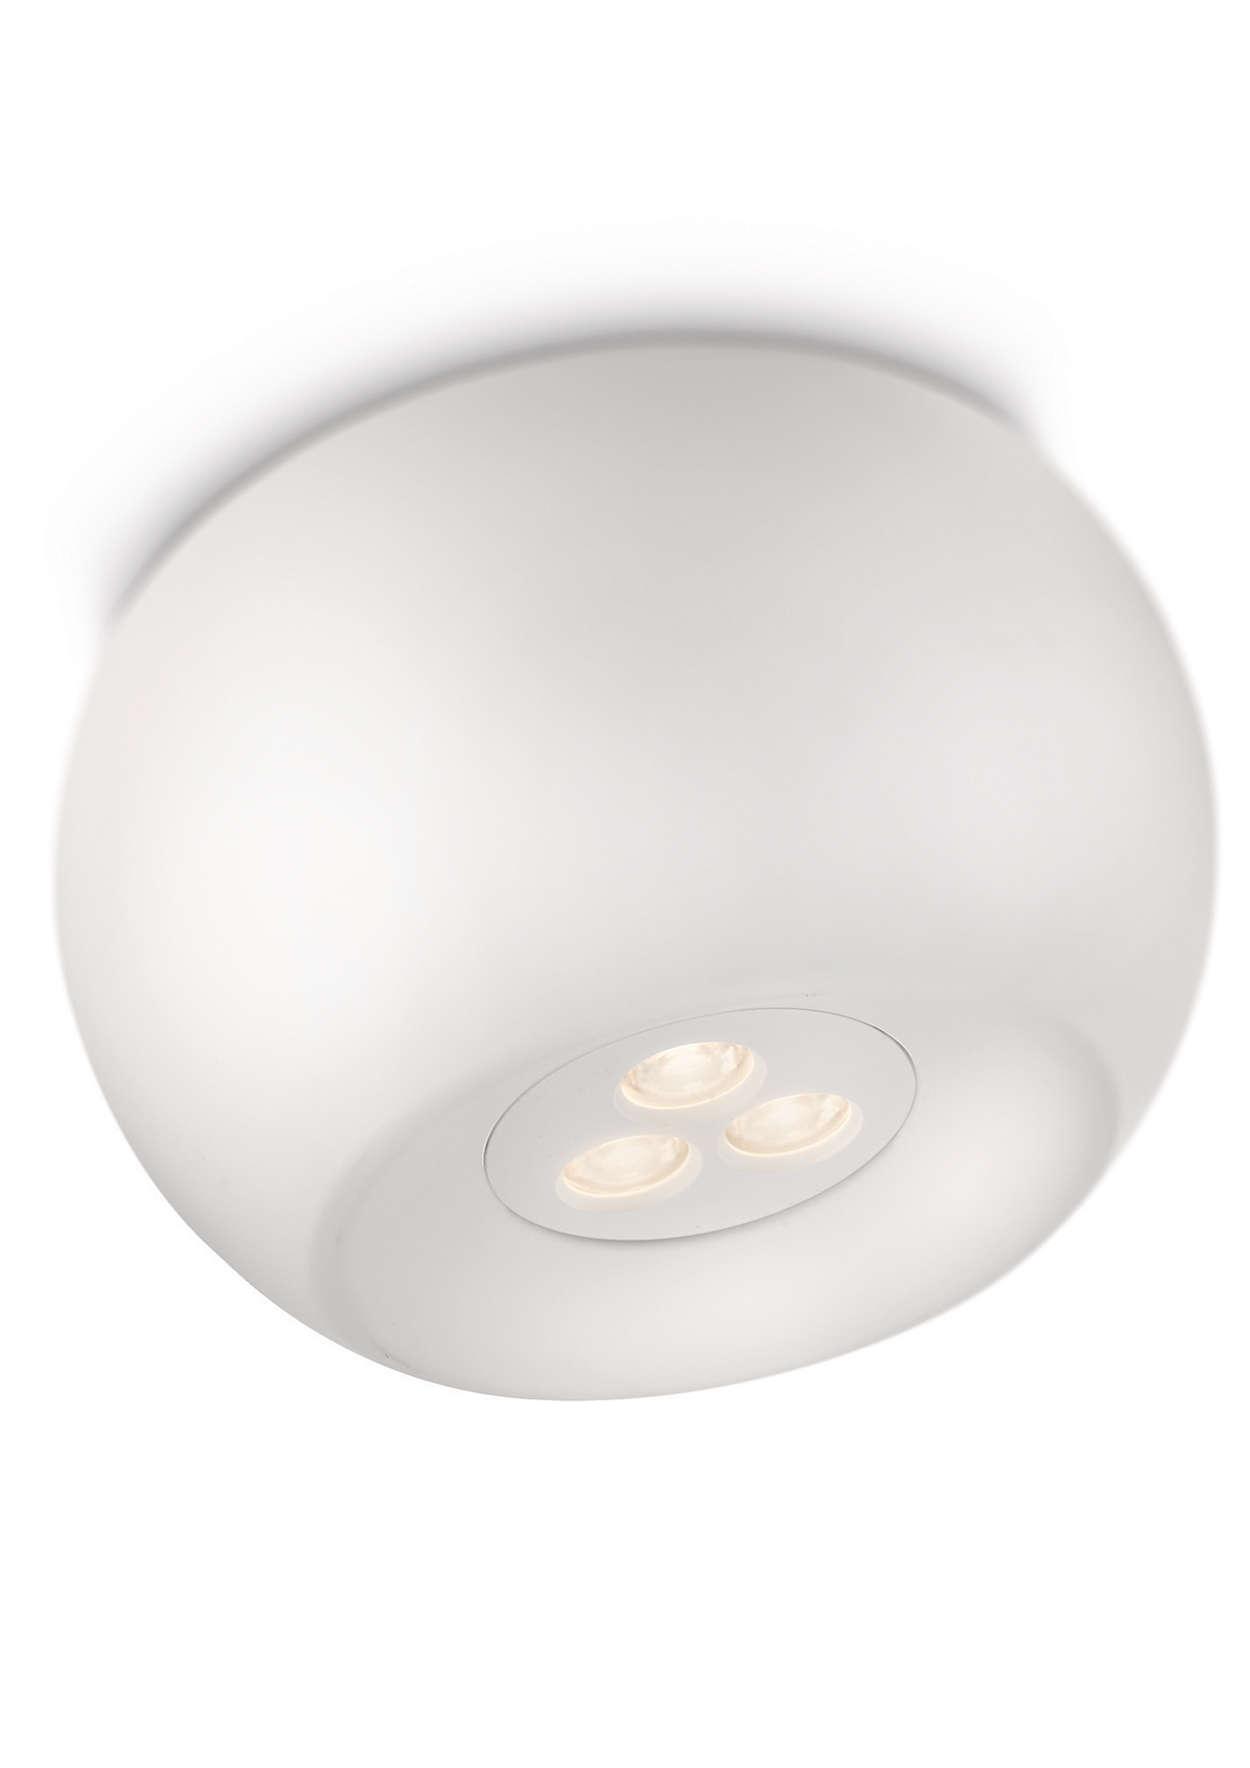 effect ceiling light chrome lighting cat departments indoor lights annellus lamp